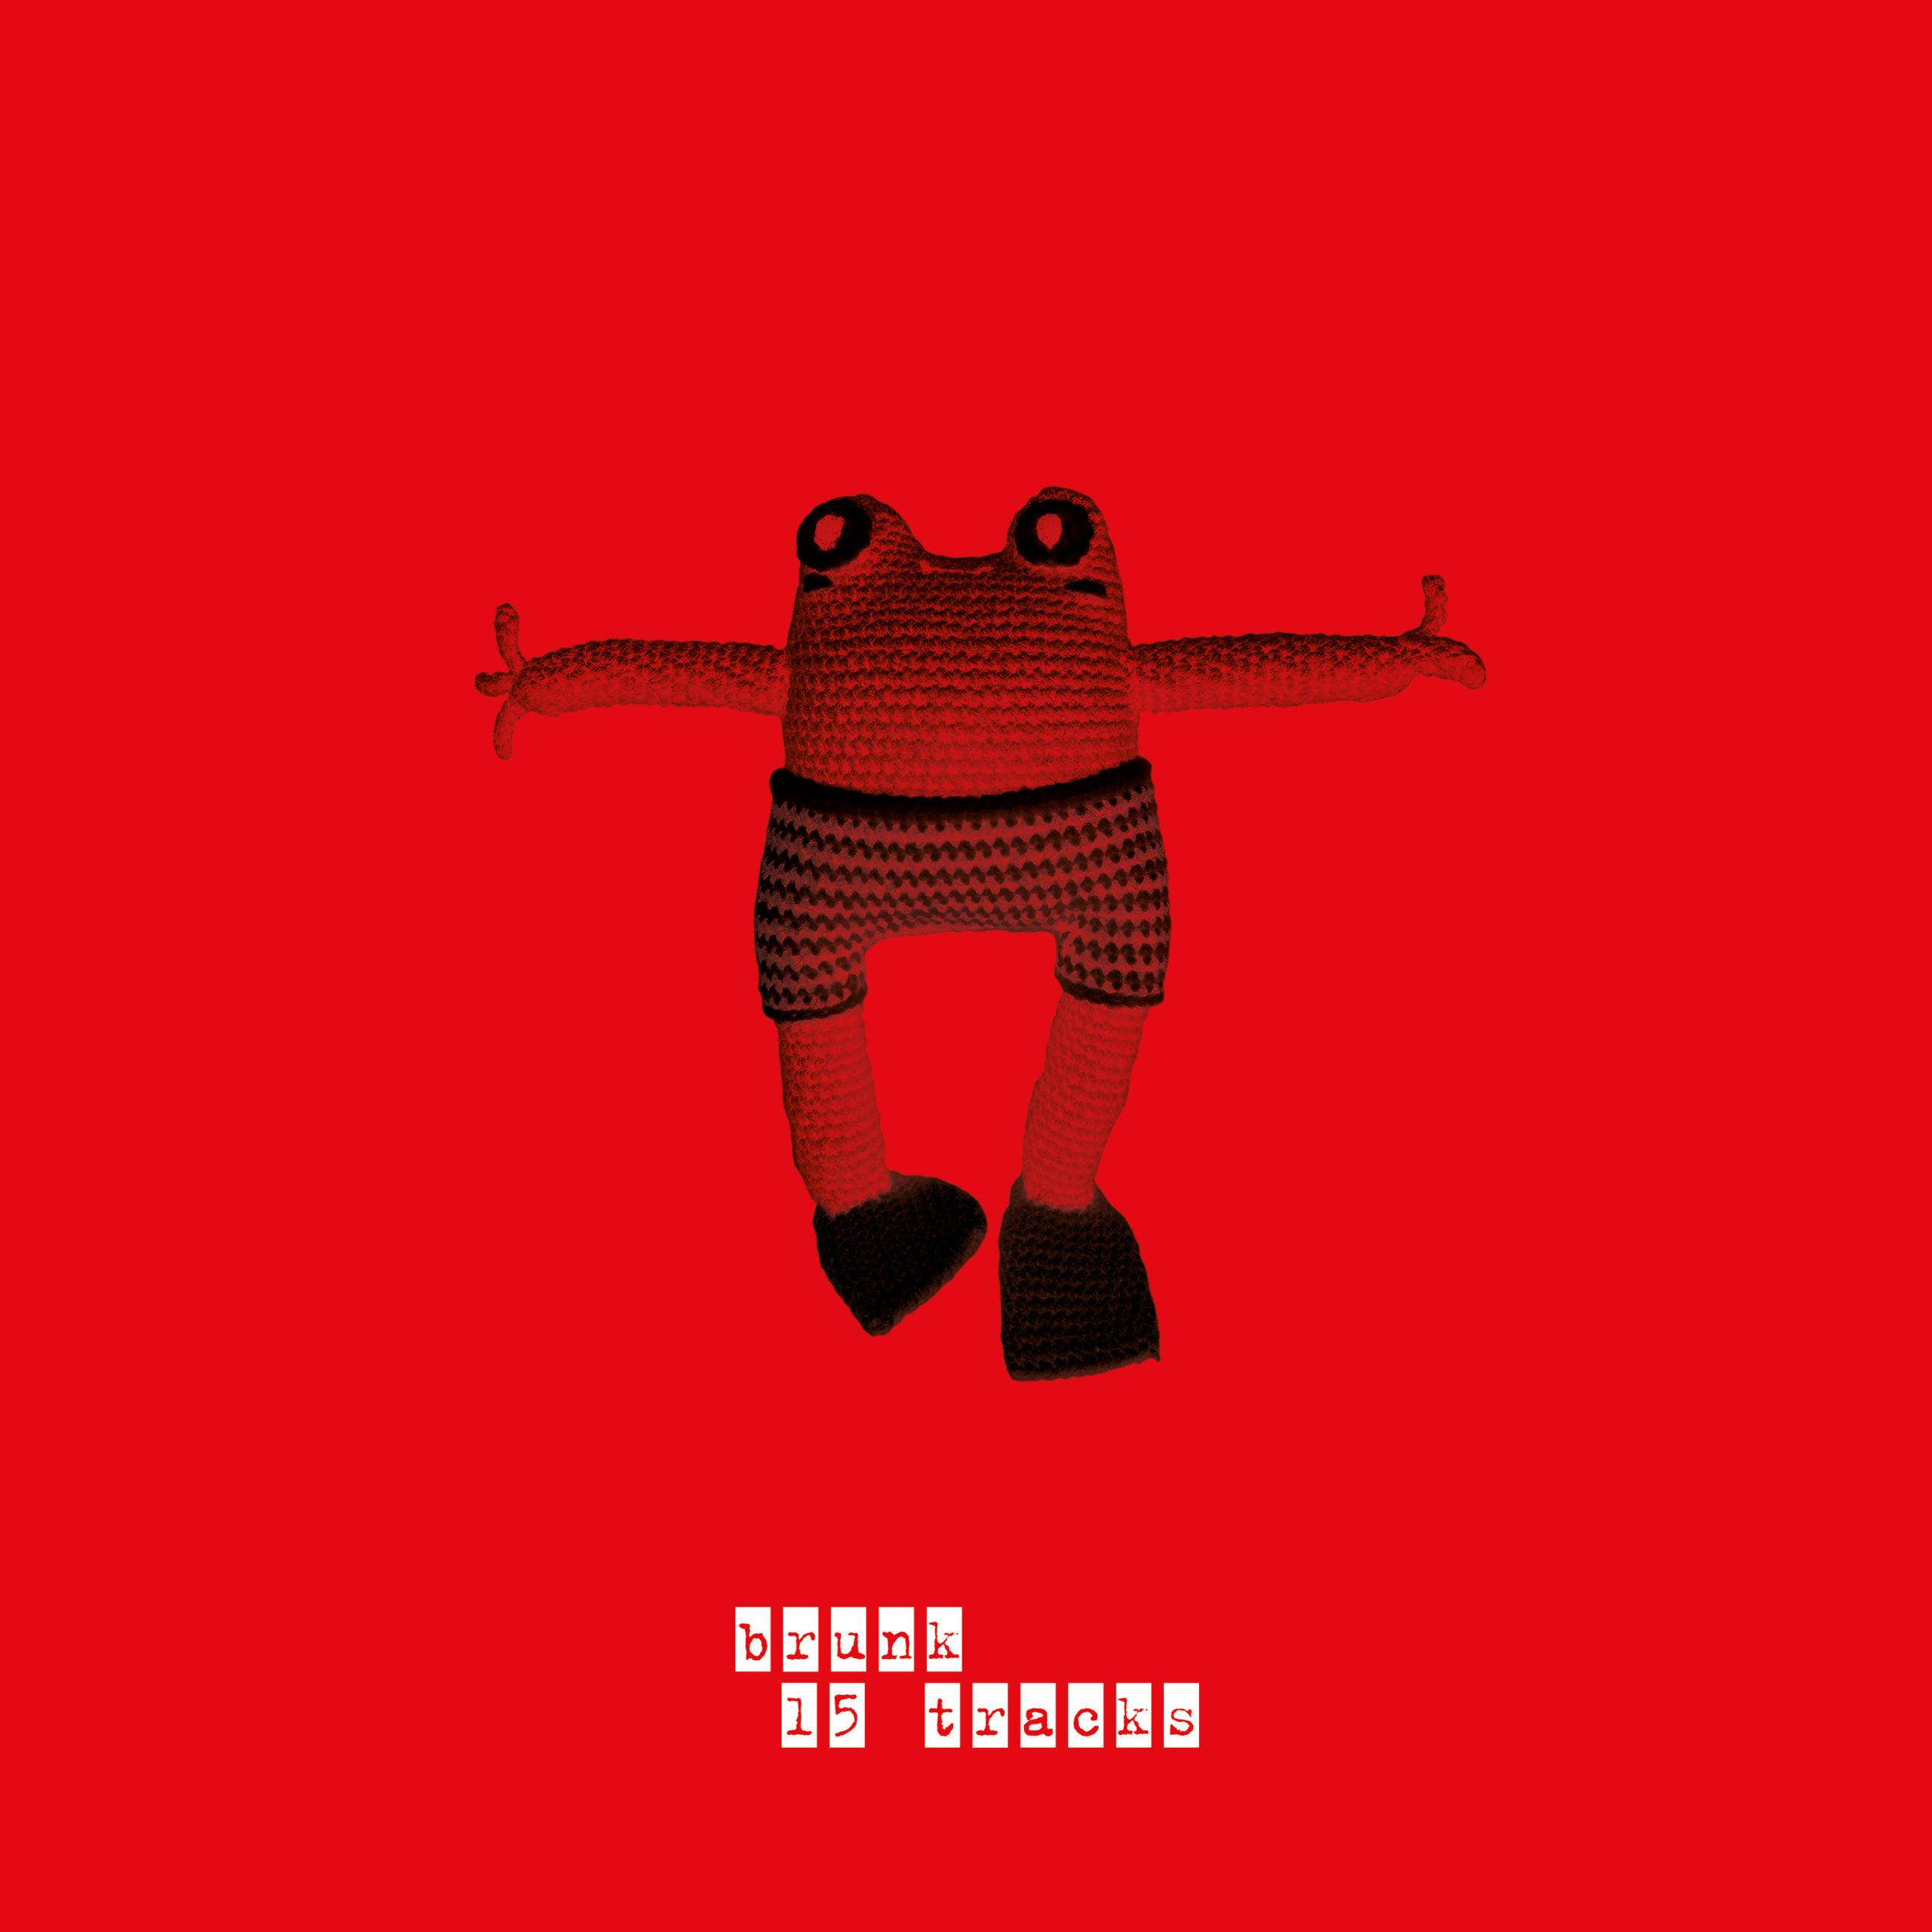 brunk – 15 tracks